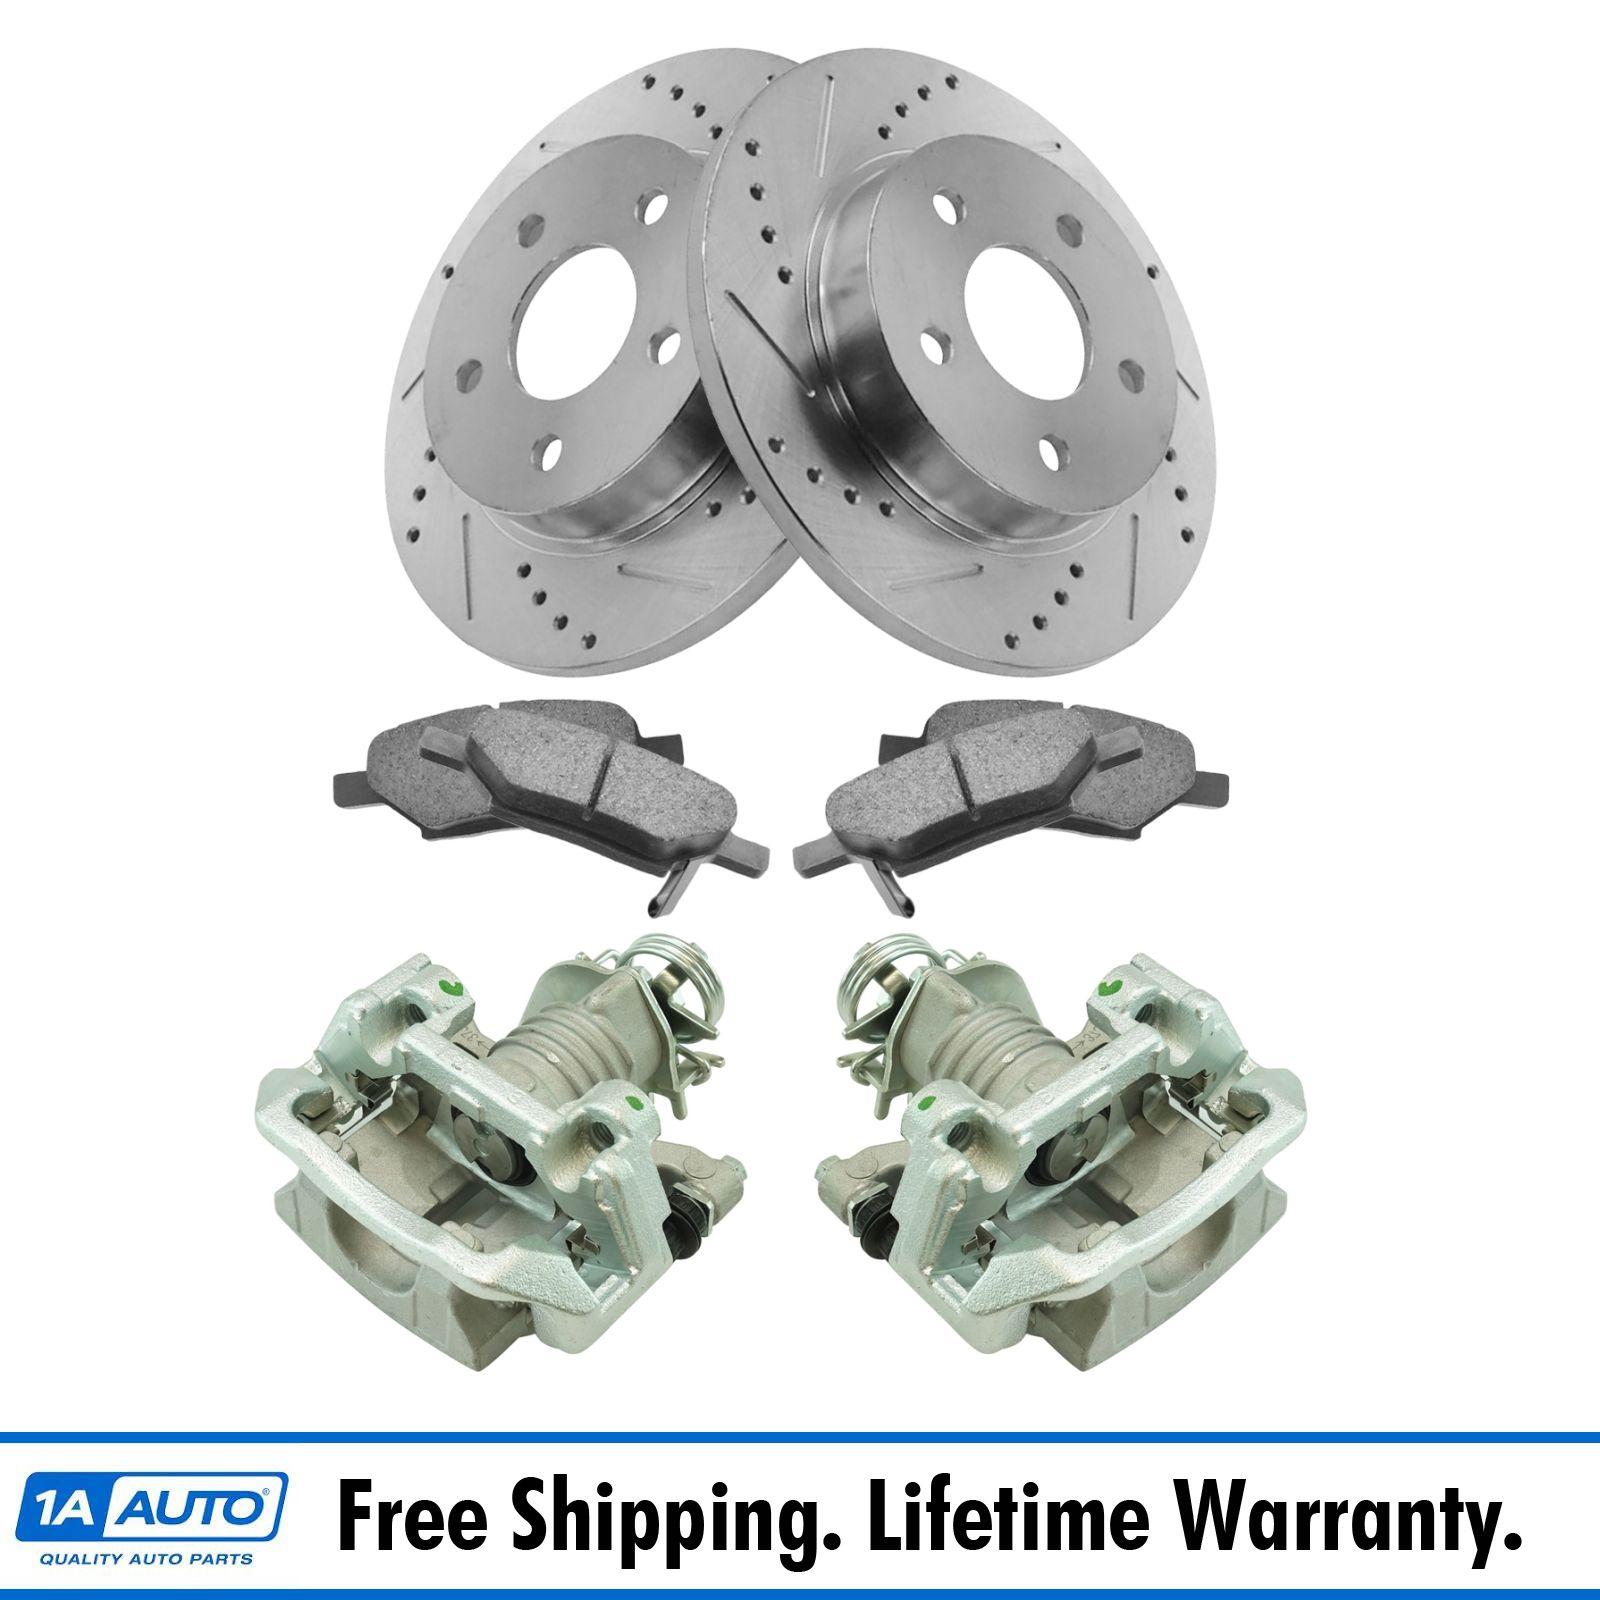 Front Brake Ceramic Brake Pad Performance Rotor /& New Caliper Pair Kit for Honda